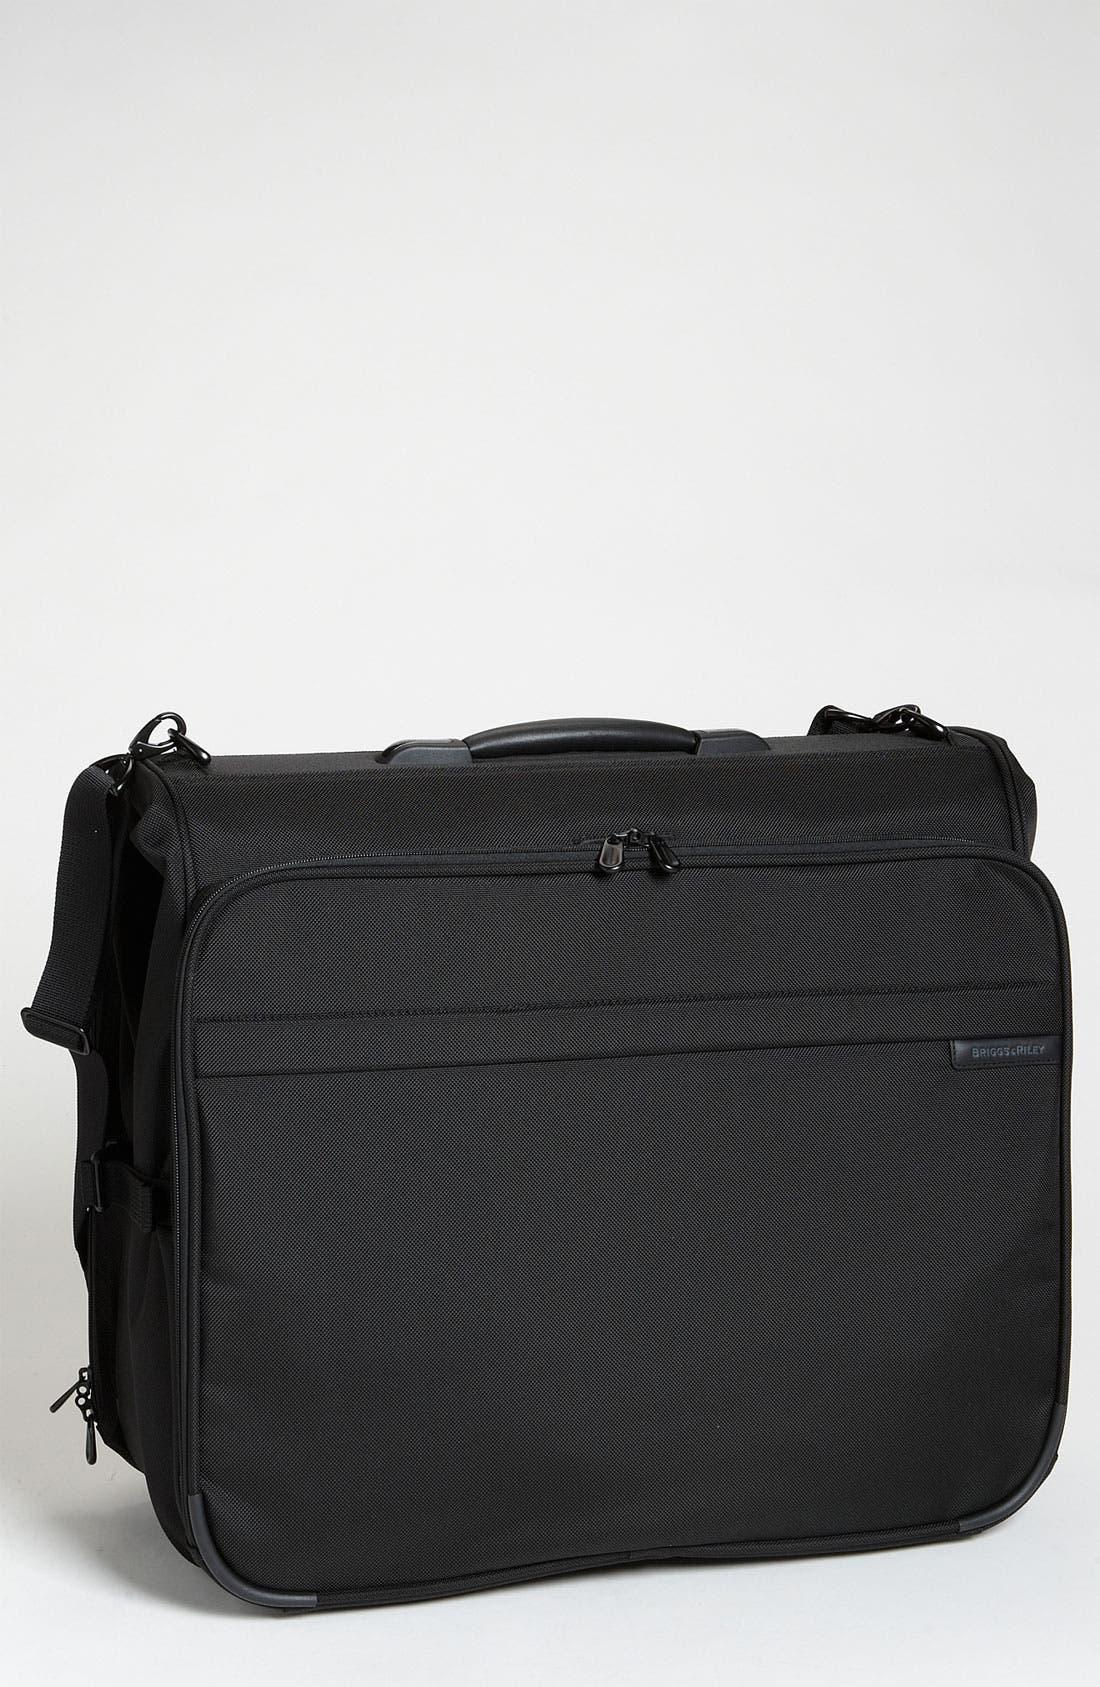 Alternate Image 1 Selected - Briggs & Riley 'Baseline - Deluxe' Garment Bag (22 Inch)